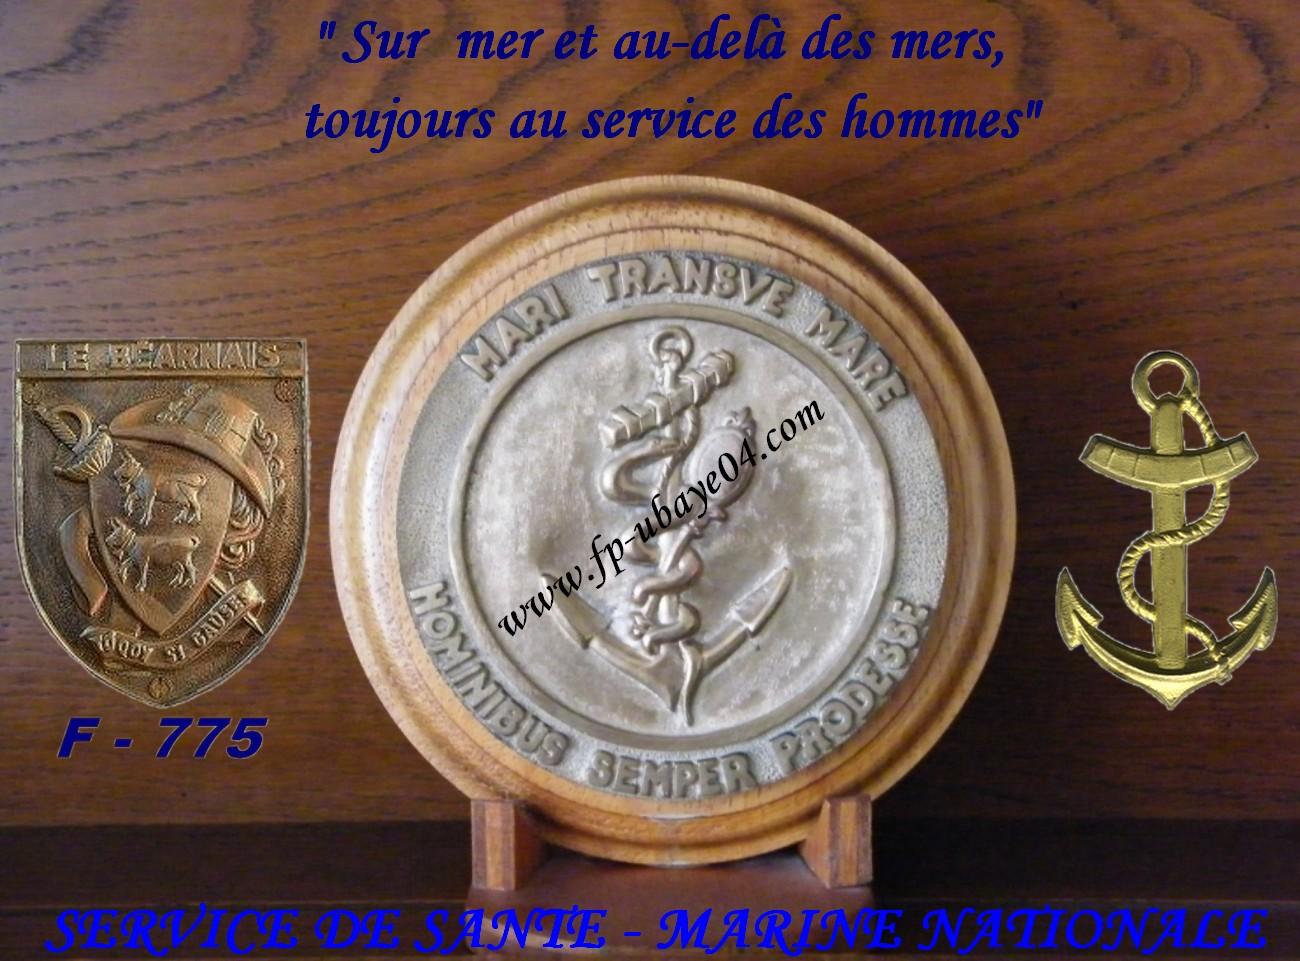 2015-06-10 - Service de Santé Marine .jpg